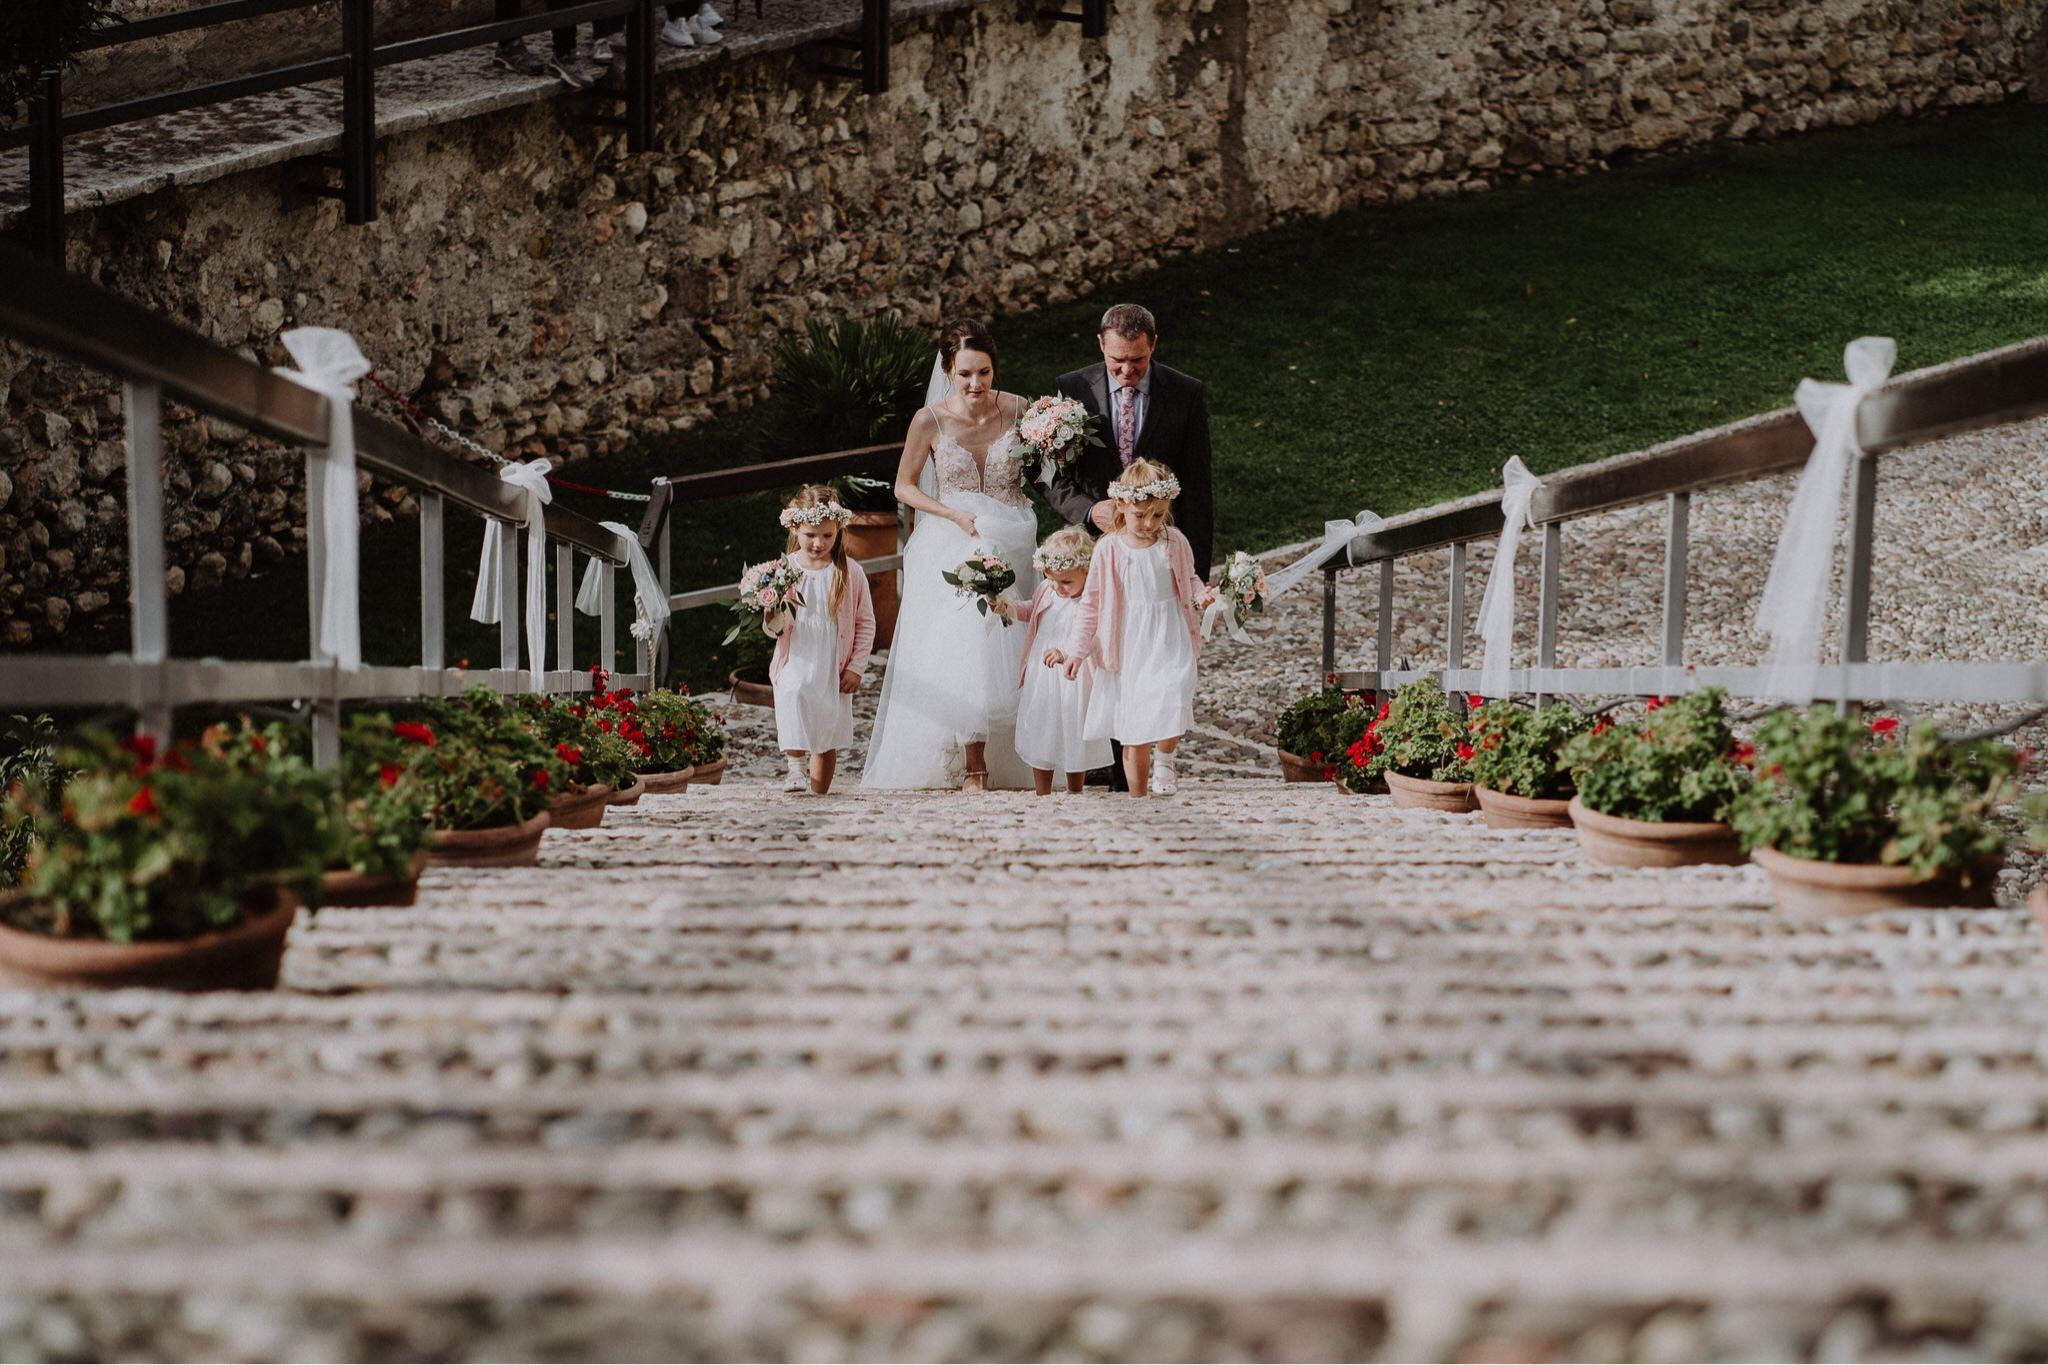 33 la 03 zeremonie 1015 weddinphotographer Hochzeitsfotograf newzealand hamilton Weddingphotography Stuttgart